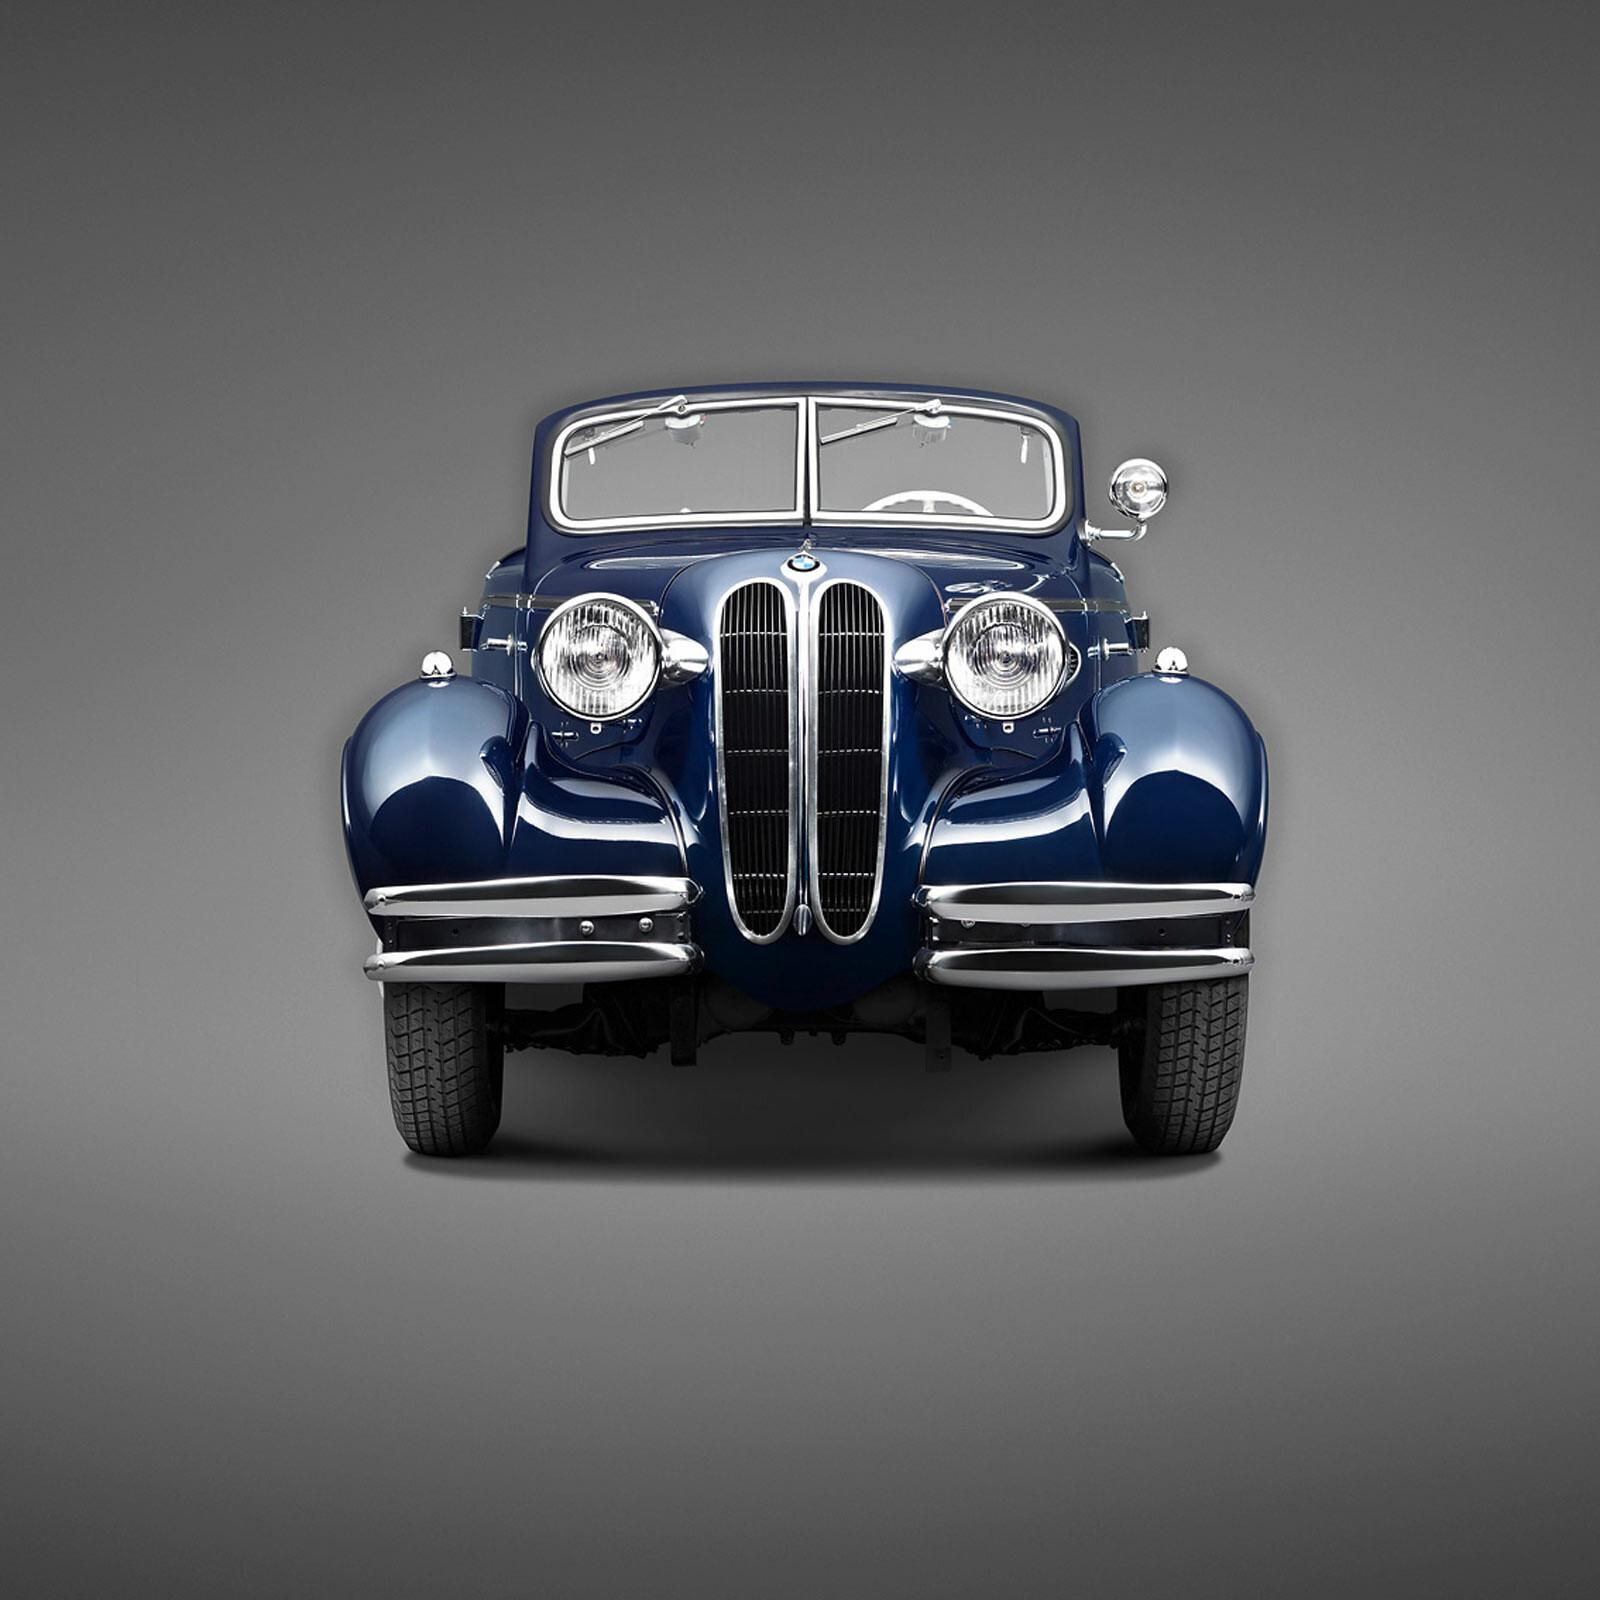 BMW 326 Front - Bmw Edition | Erik Chmil